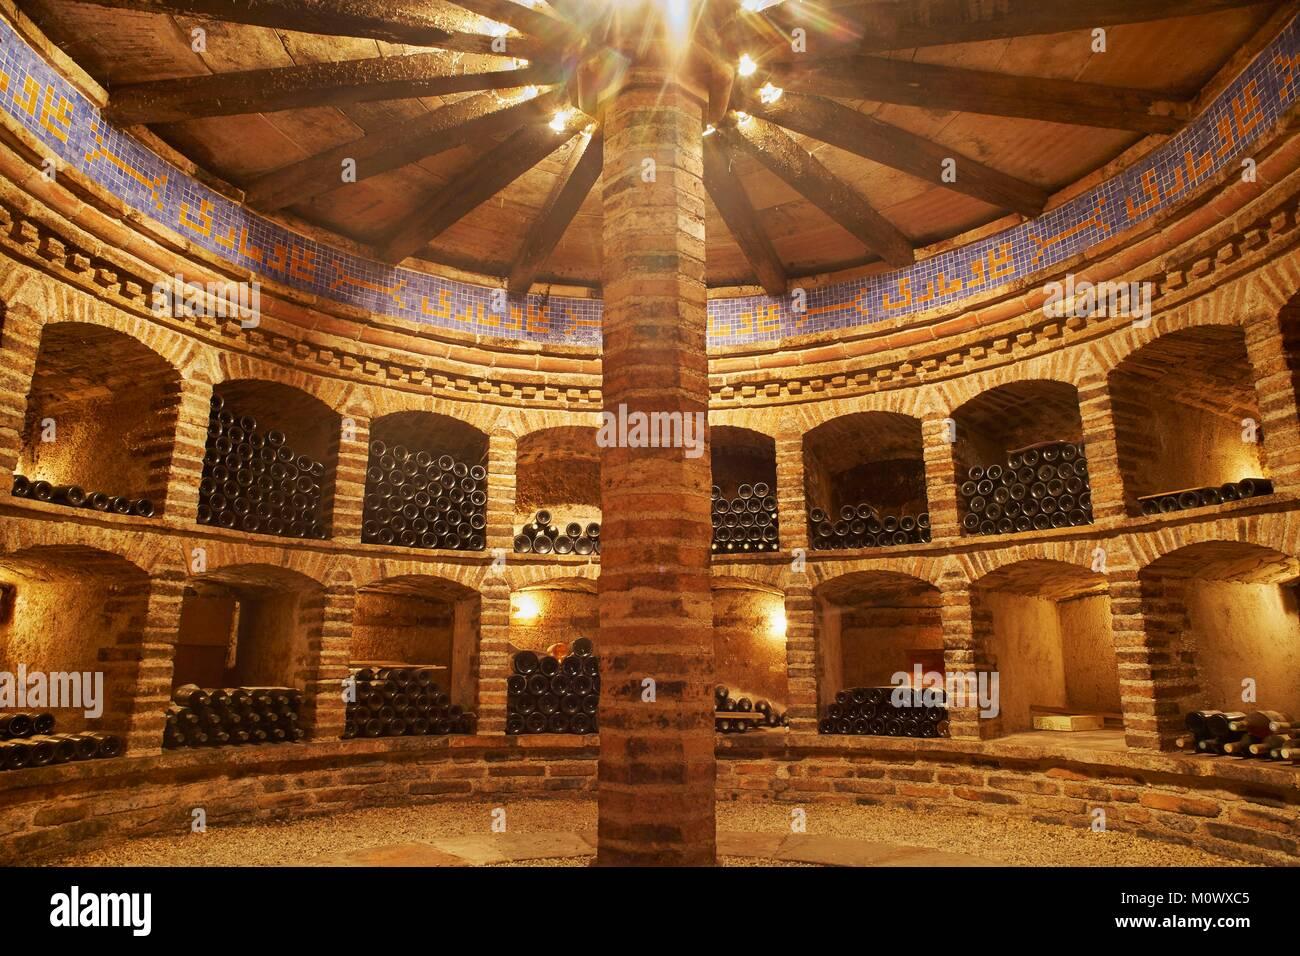 France,Tarn et Garonne,Labastide St Pierre,Wine Cellars of Chateau St Louis belonging to the vineyard AOC of Fronton - Stock Image